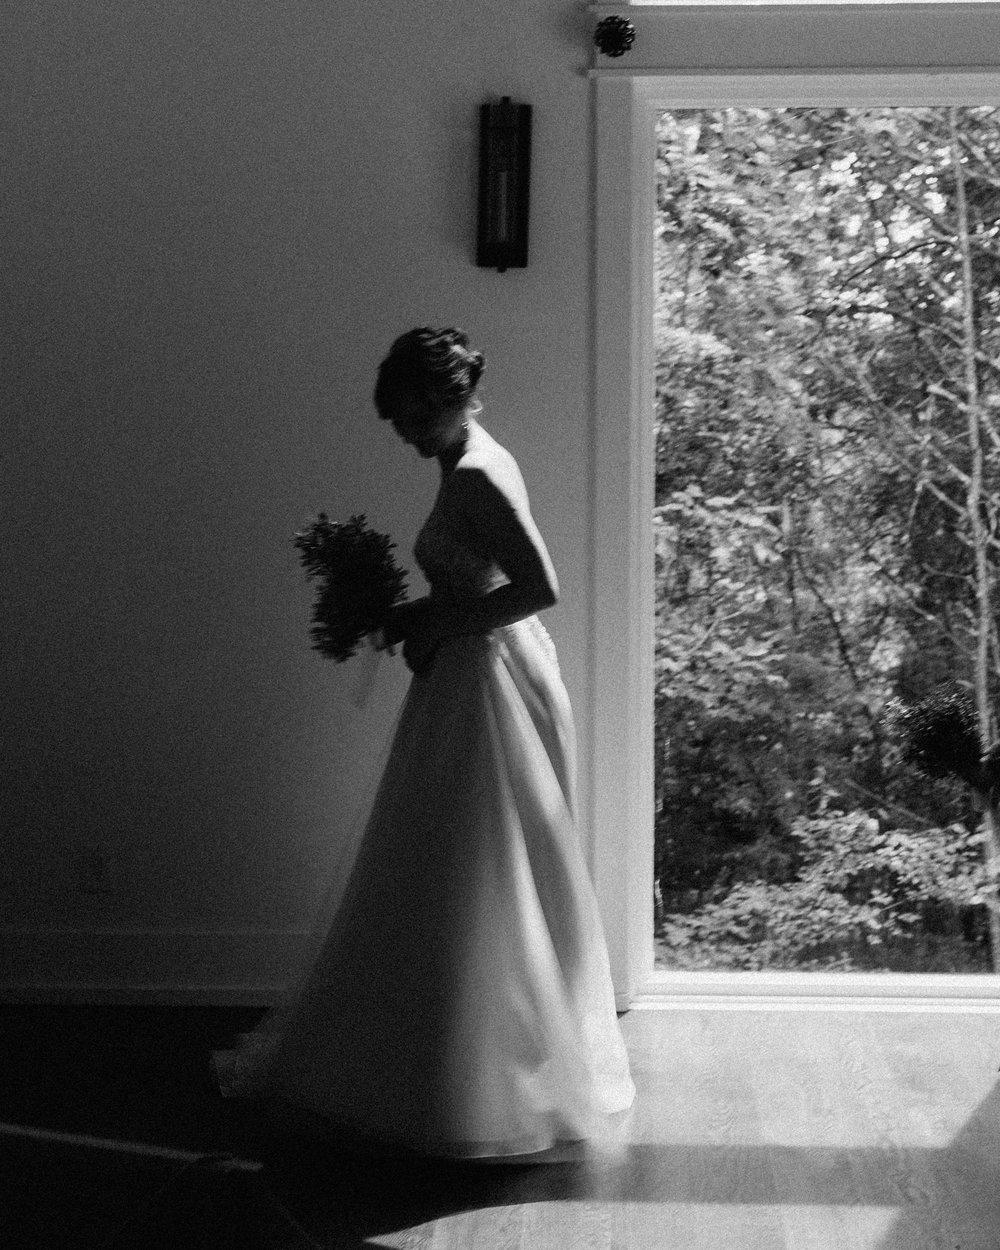 dahlonega_juliette_chapel_photojournalism_atlanta_wedding_photographers_1570.jpg